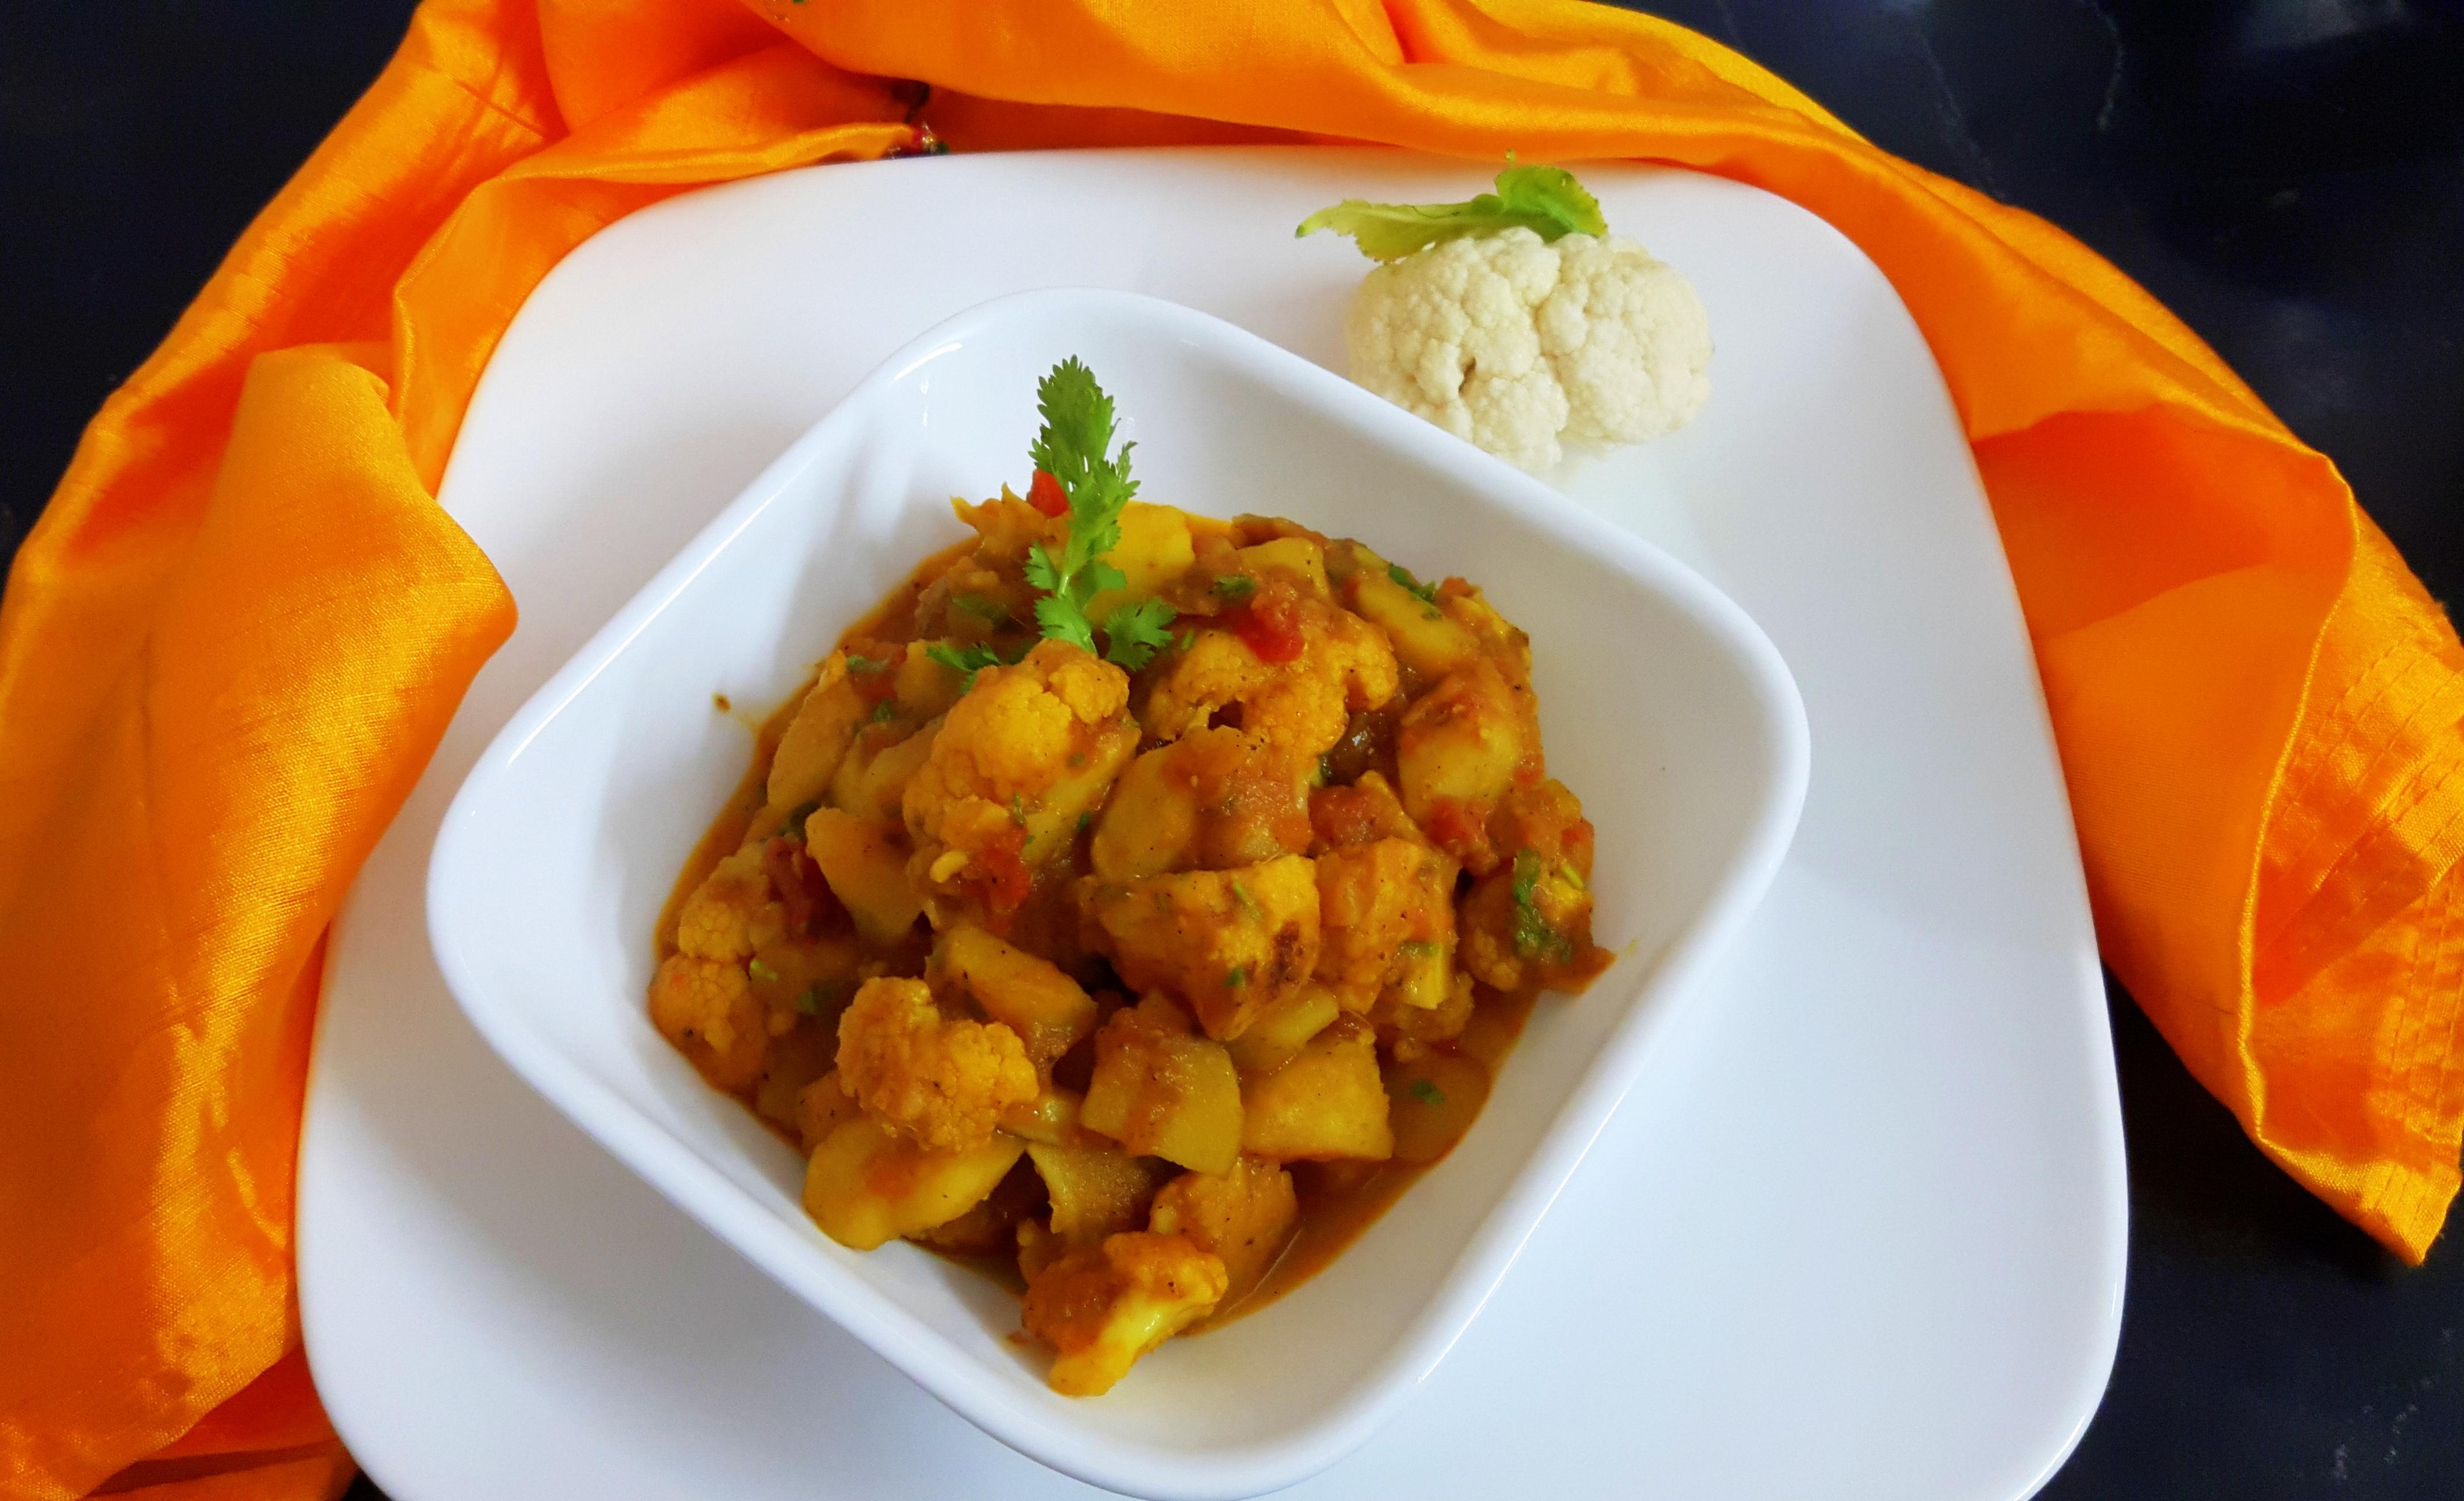 Aaloo Gobhi (potato and cauliflower) without onion and garlic